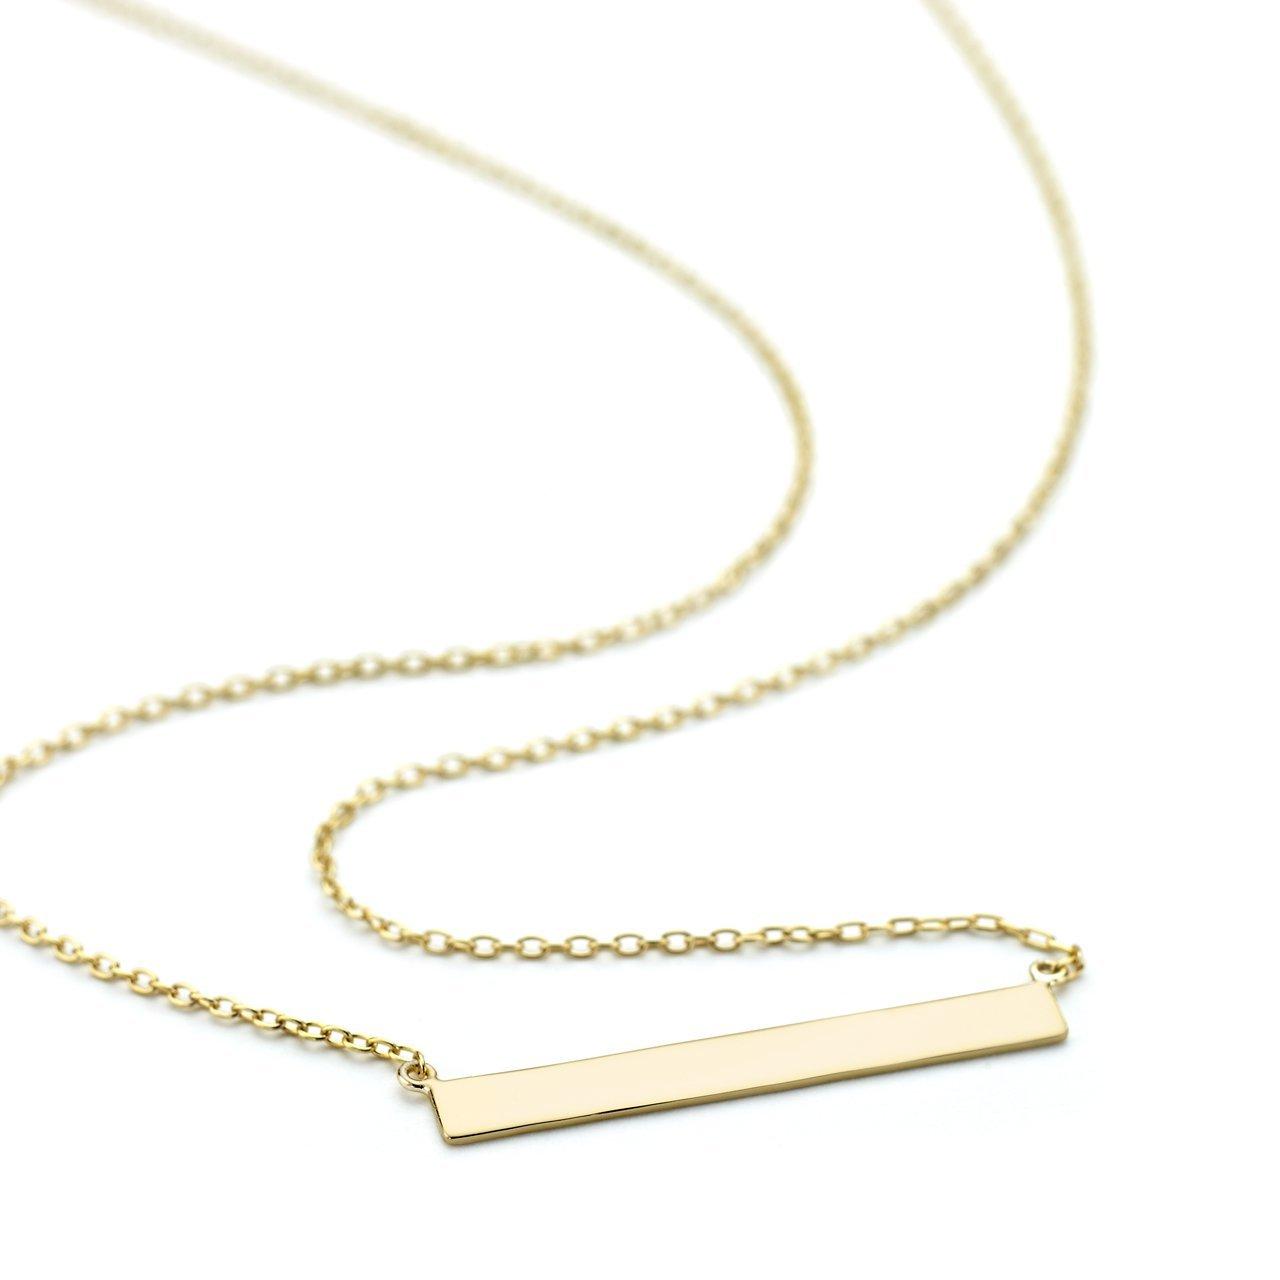 OneByOne N0011 4mm Wide Flat Bar Necklace WLD6ouSXaJ